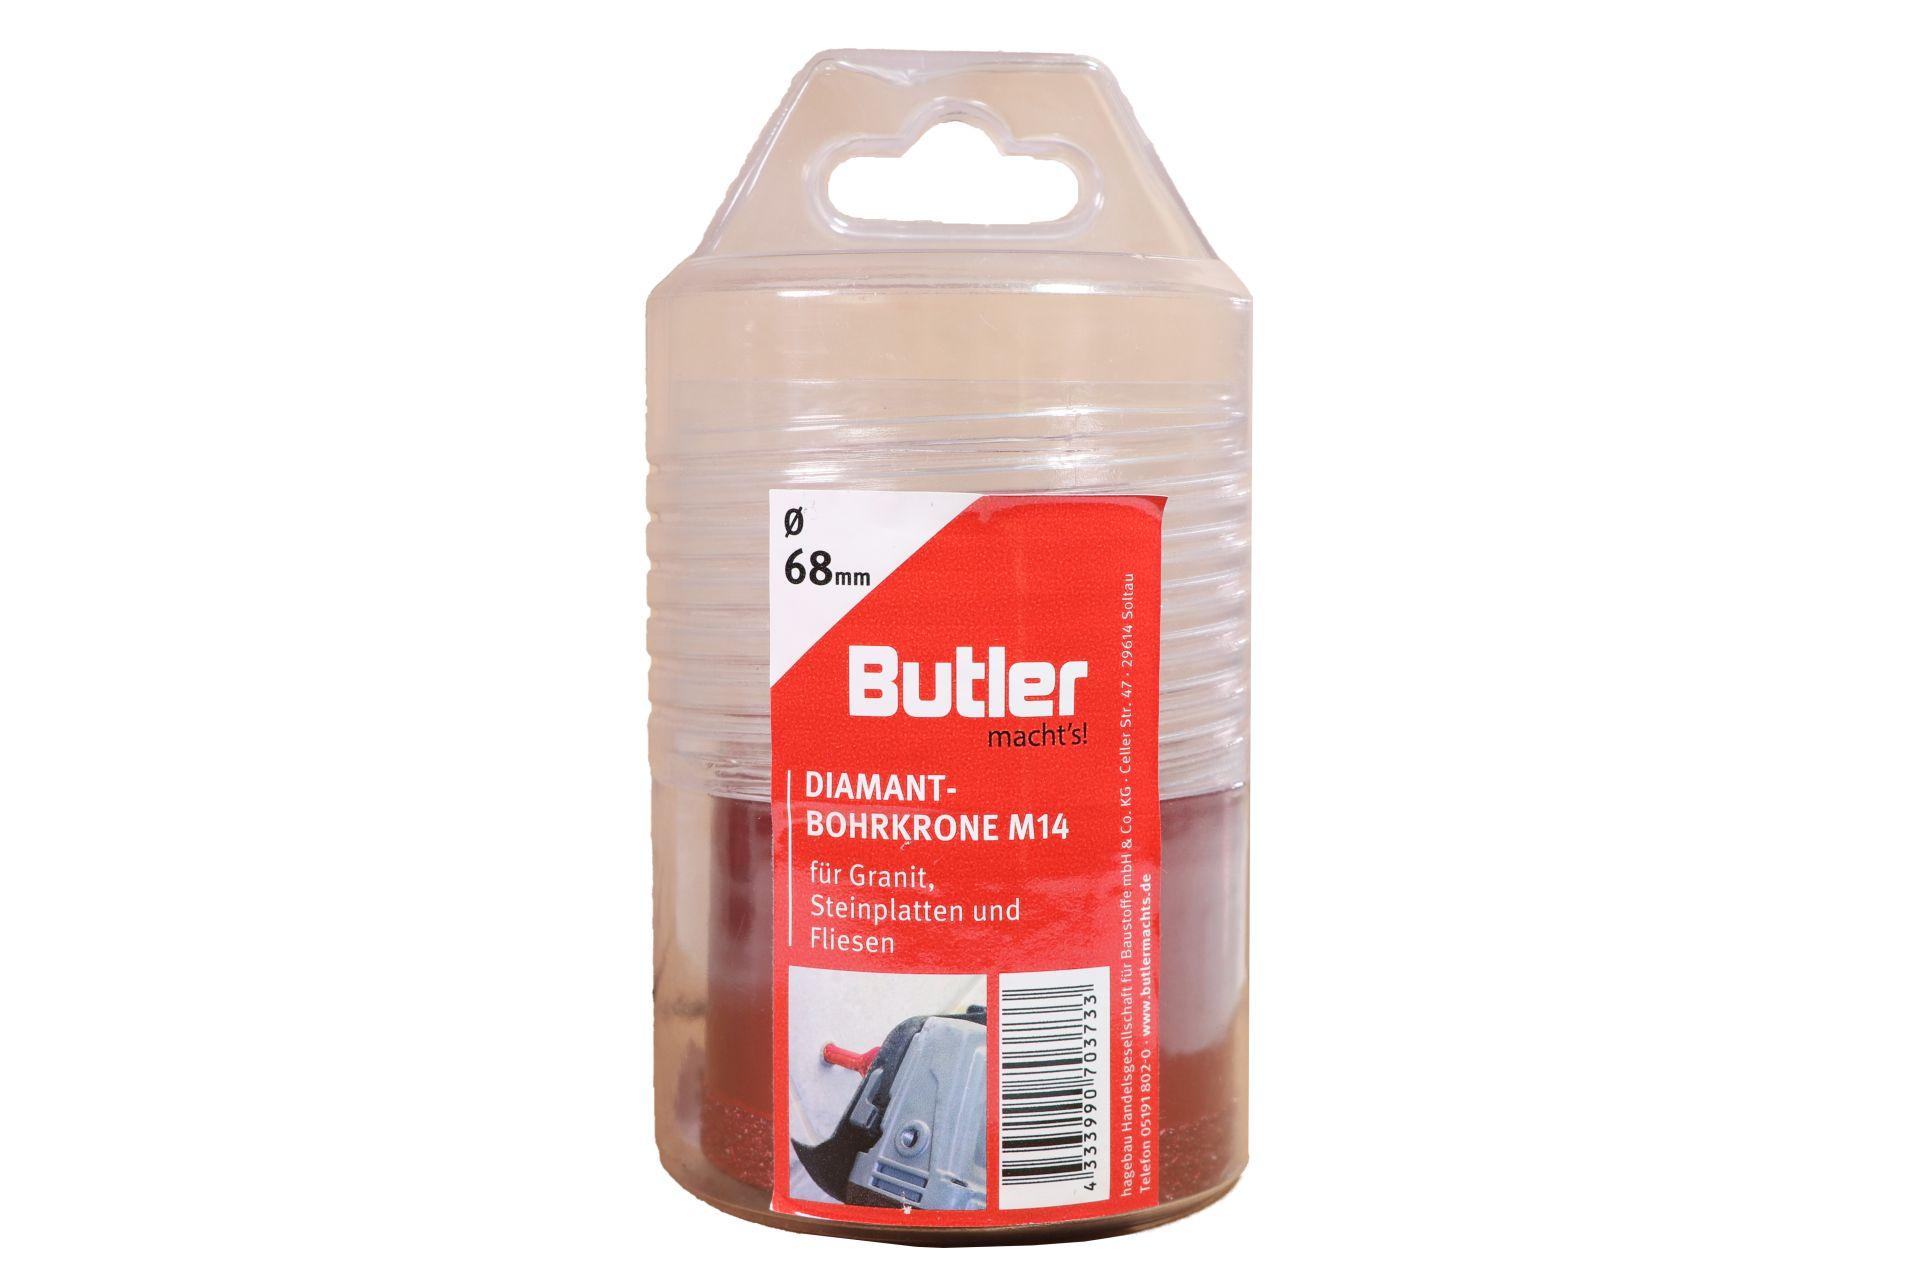 Butler macht's! Diamant-Bohrkrone, Ø 68 mm, Aufnahme M14, Bohrtiefe 45 mm